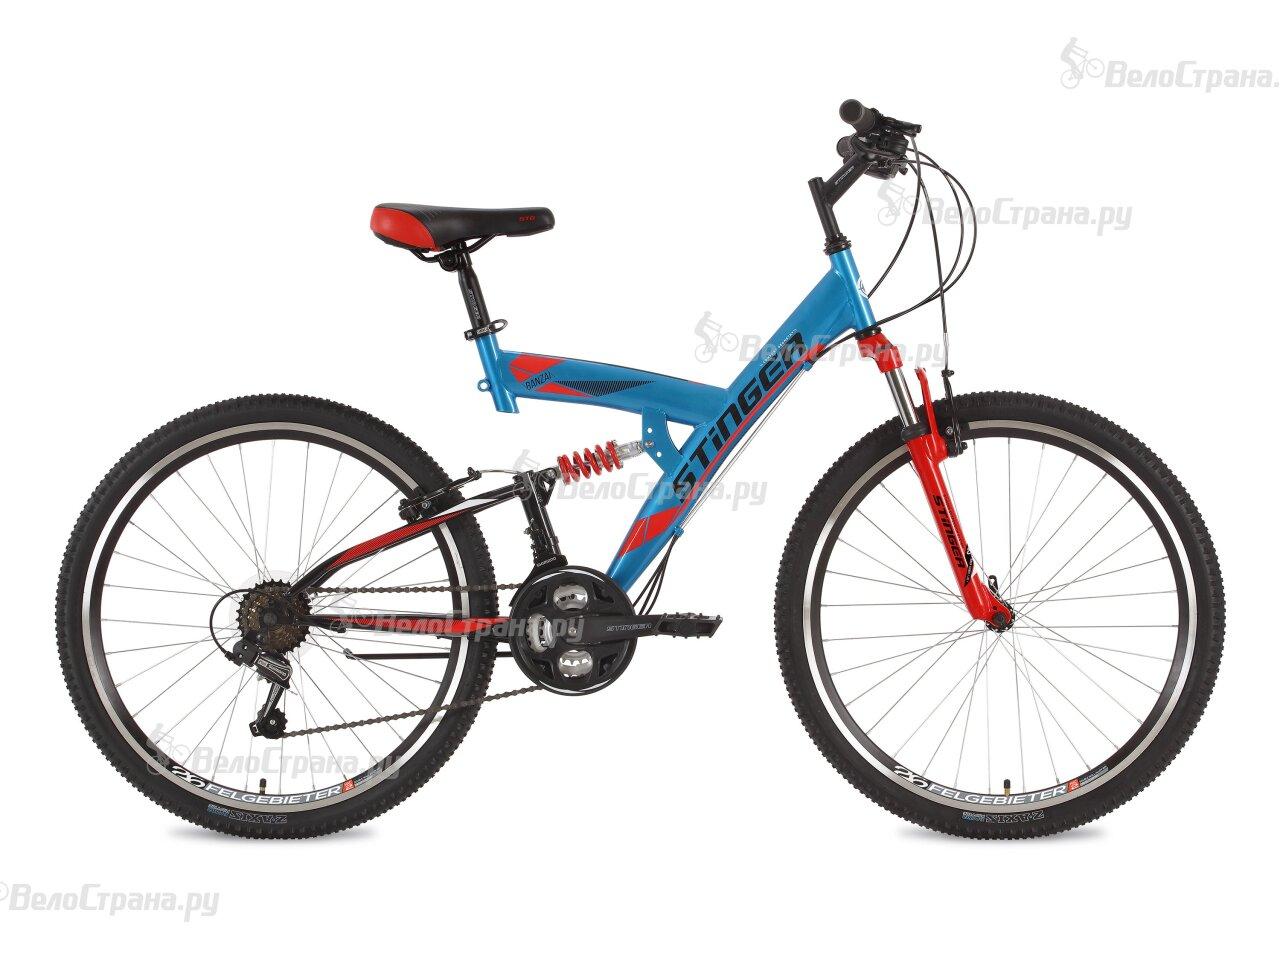 Велосипед Stinger Banzai 26 (2018) велосипед stinger cruiser l 26 2016